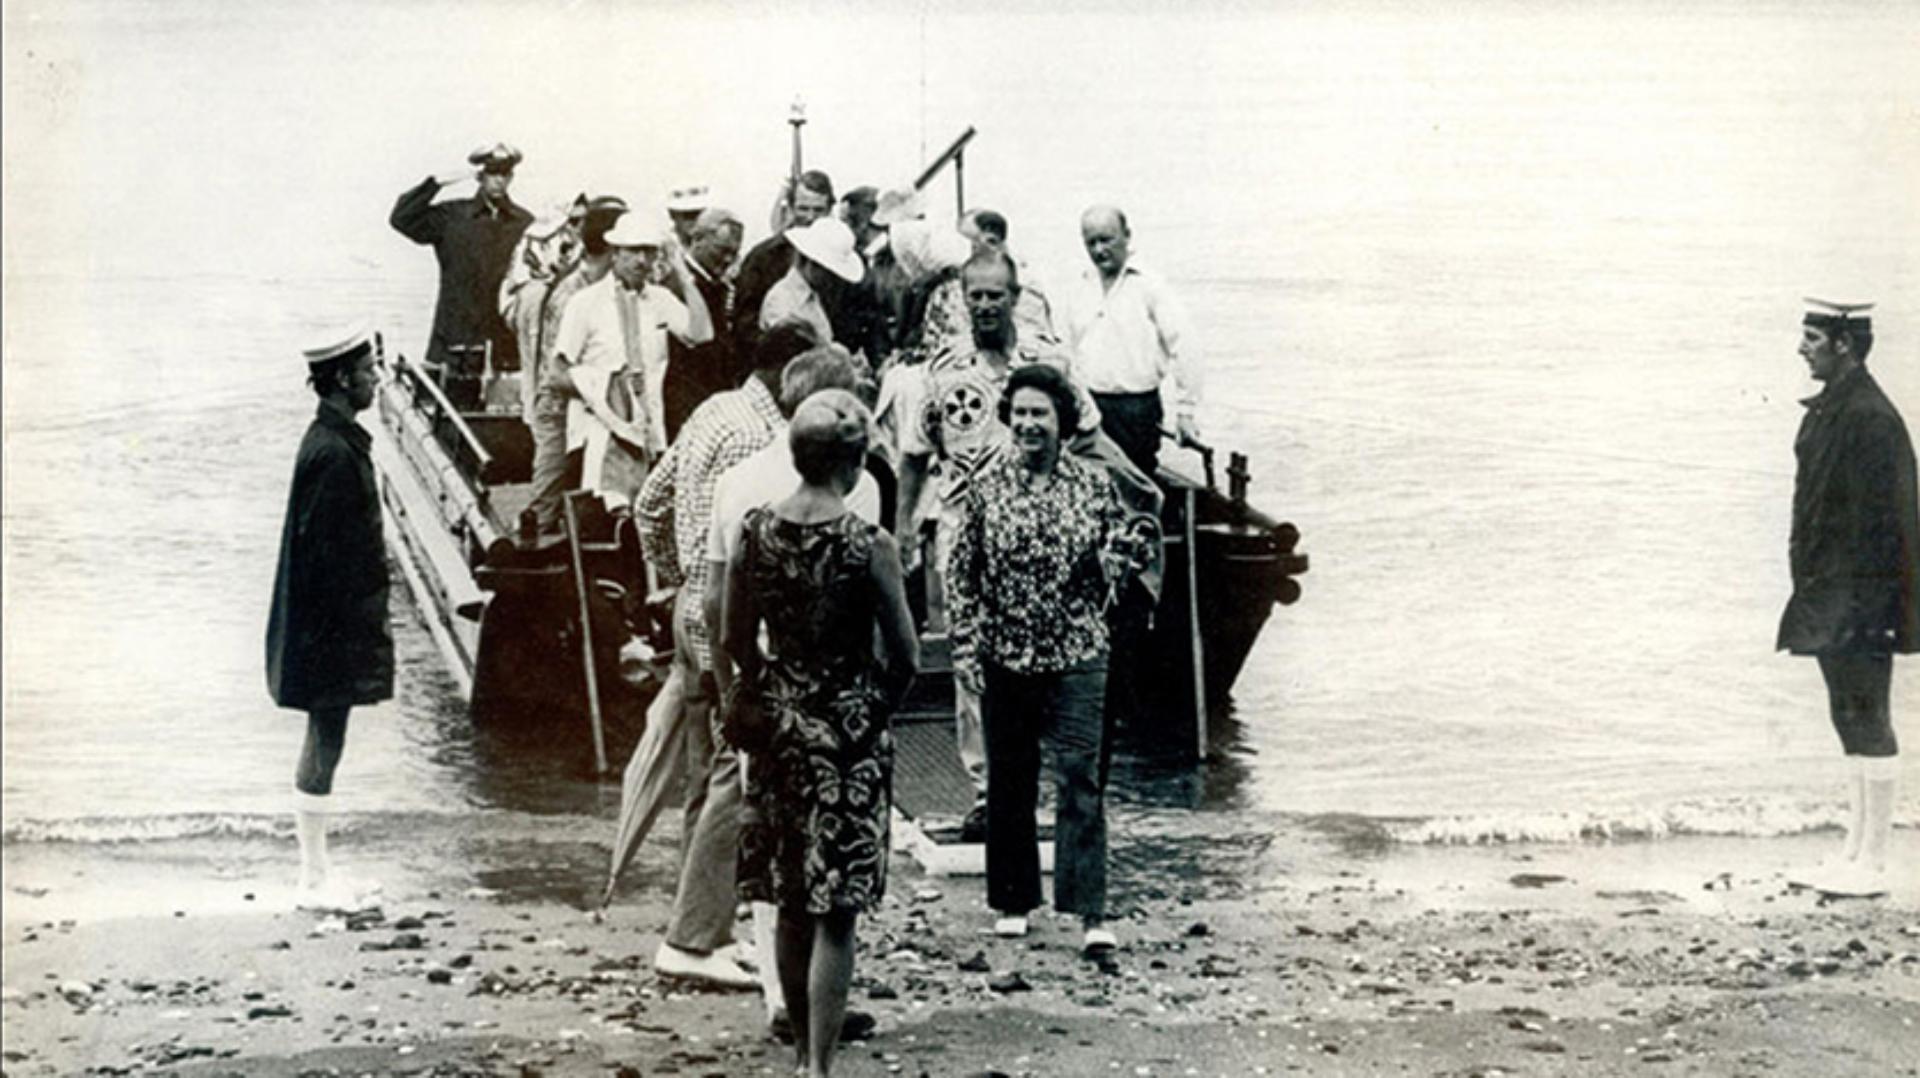 Queen Elizabeth II and the Duke of Edinburgh disembarking their Sea Truck